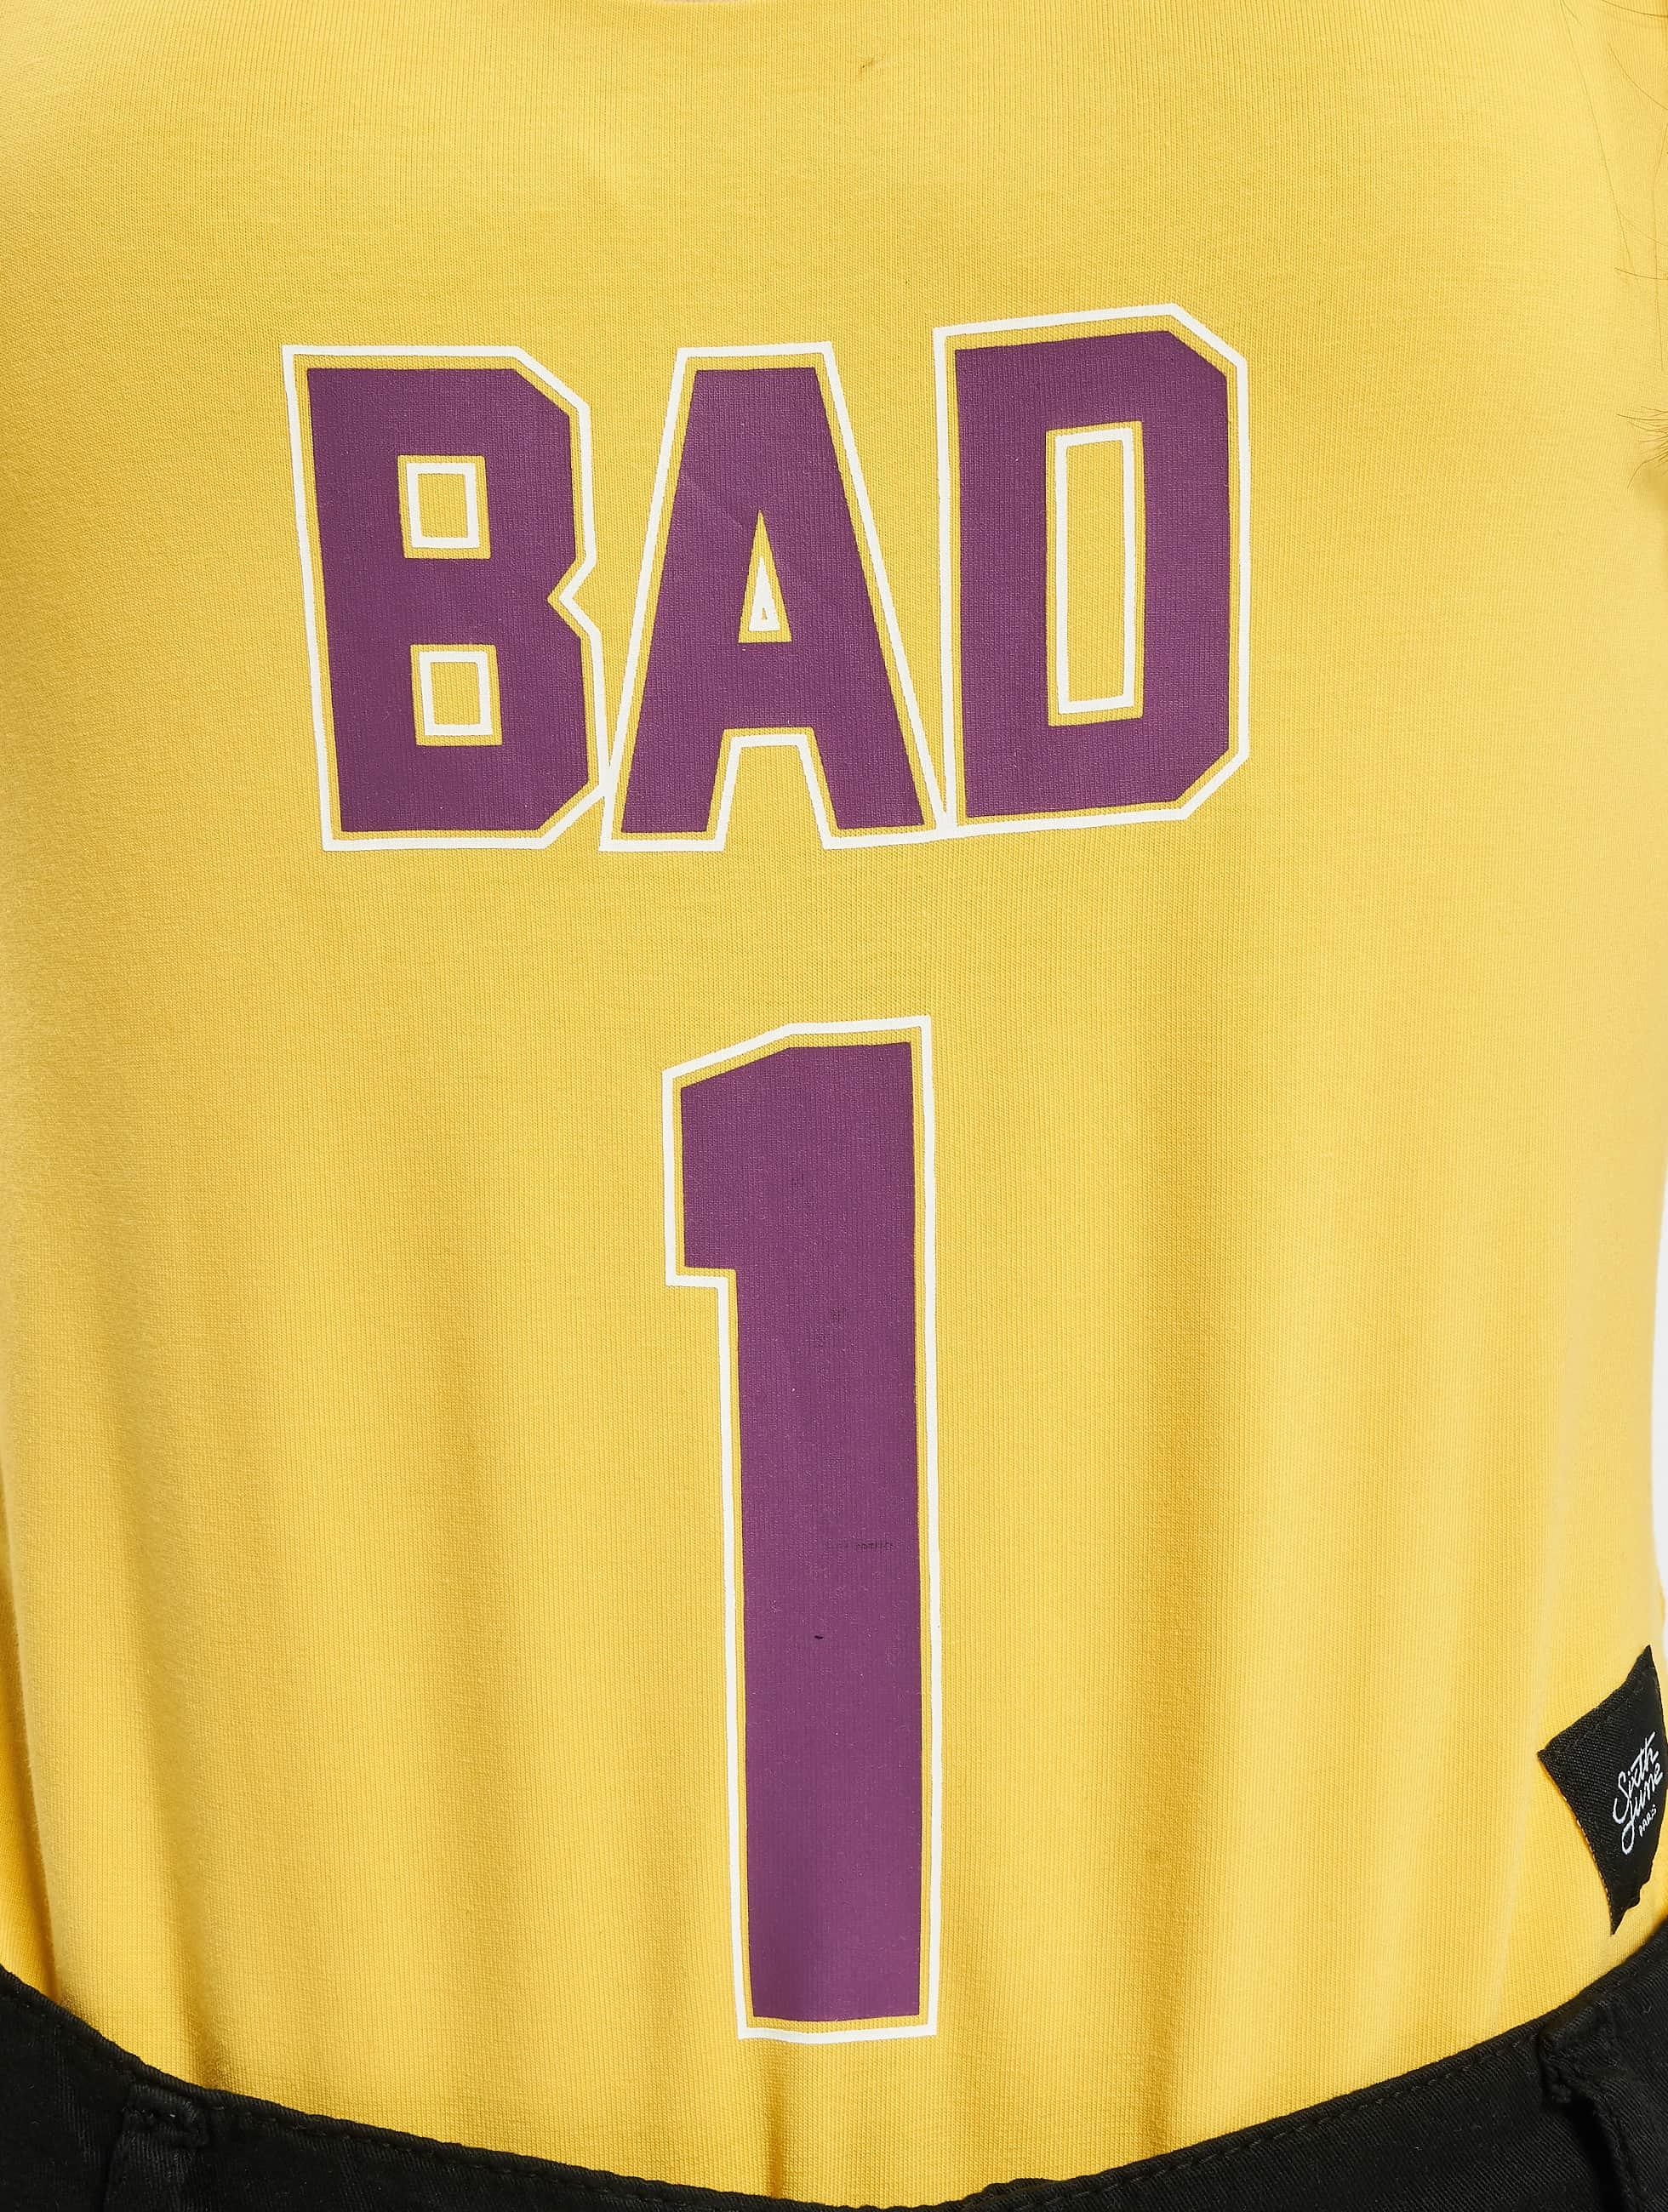 Sixth June Body Bad yellow